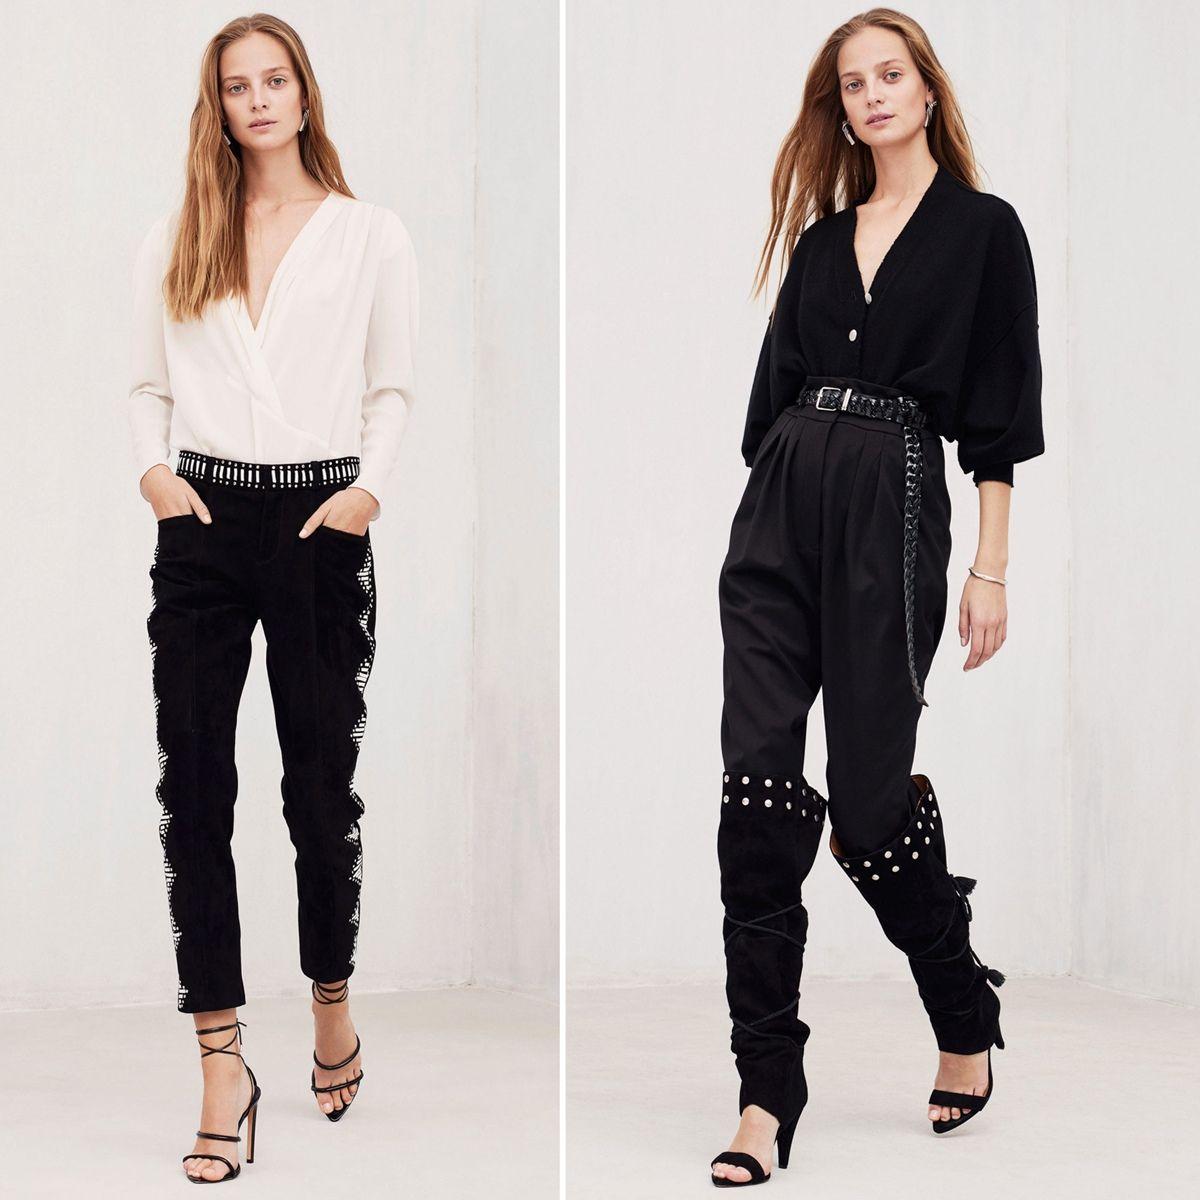 #мода #весна2019 #ss2019 #минимализмводежде #стильмонохром ...